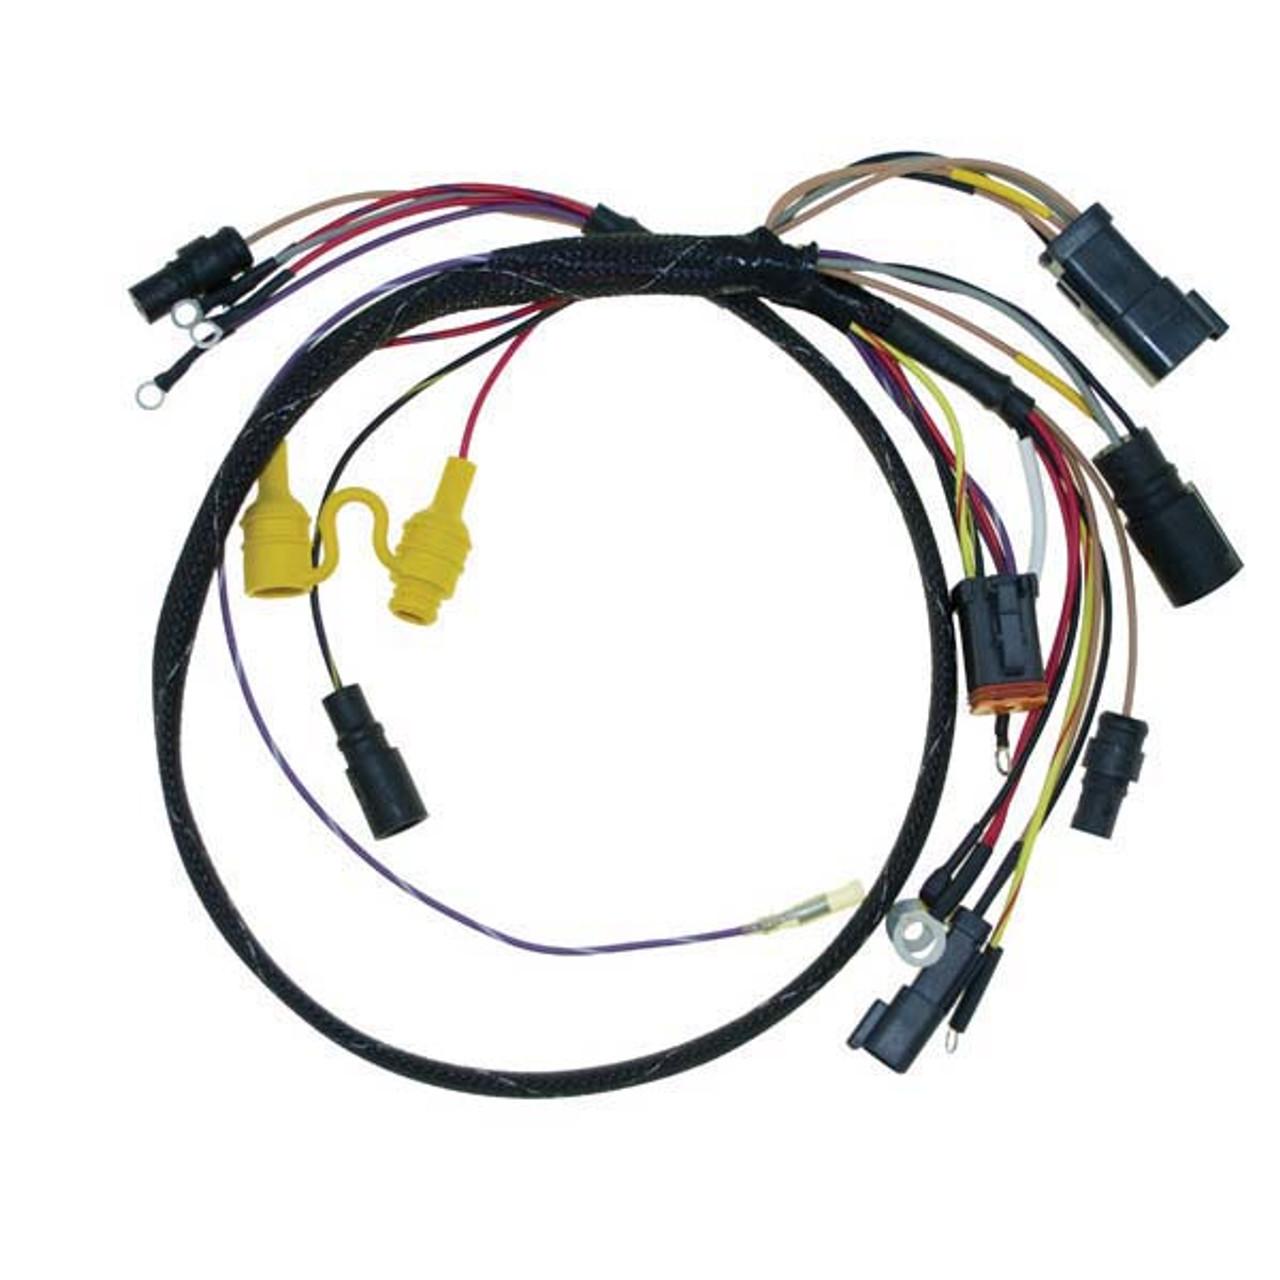 [DIAGRAM_38YU]  CDI 413-6027 Johnson/Evinrude Wiring Harness 4 Cyl. | Johnson Evinrude Wiring Harness |  | Wholesale Marine